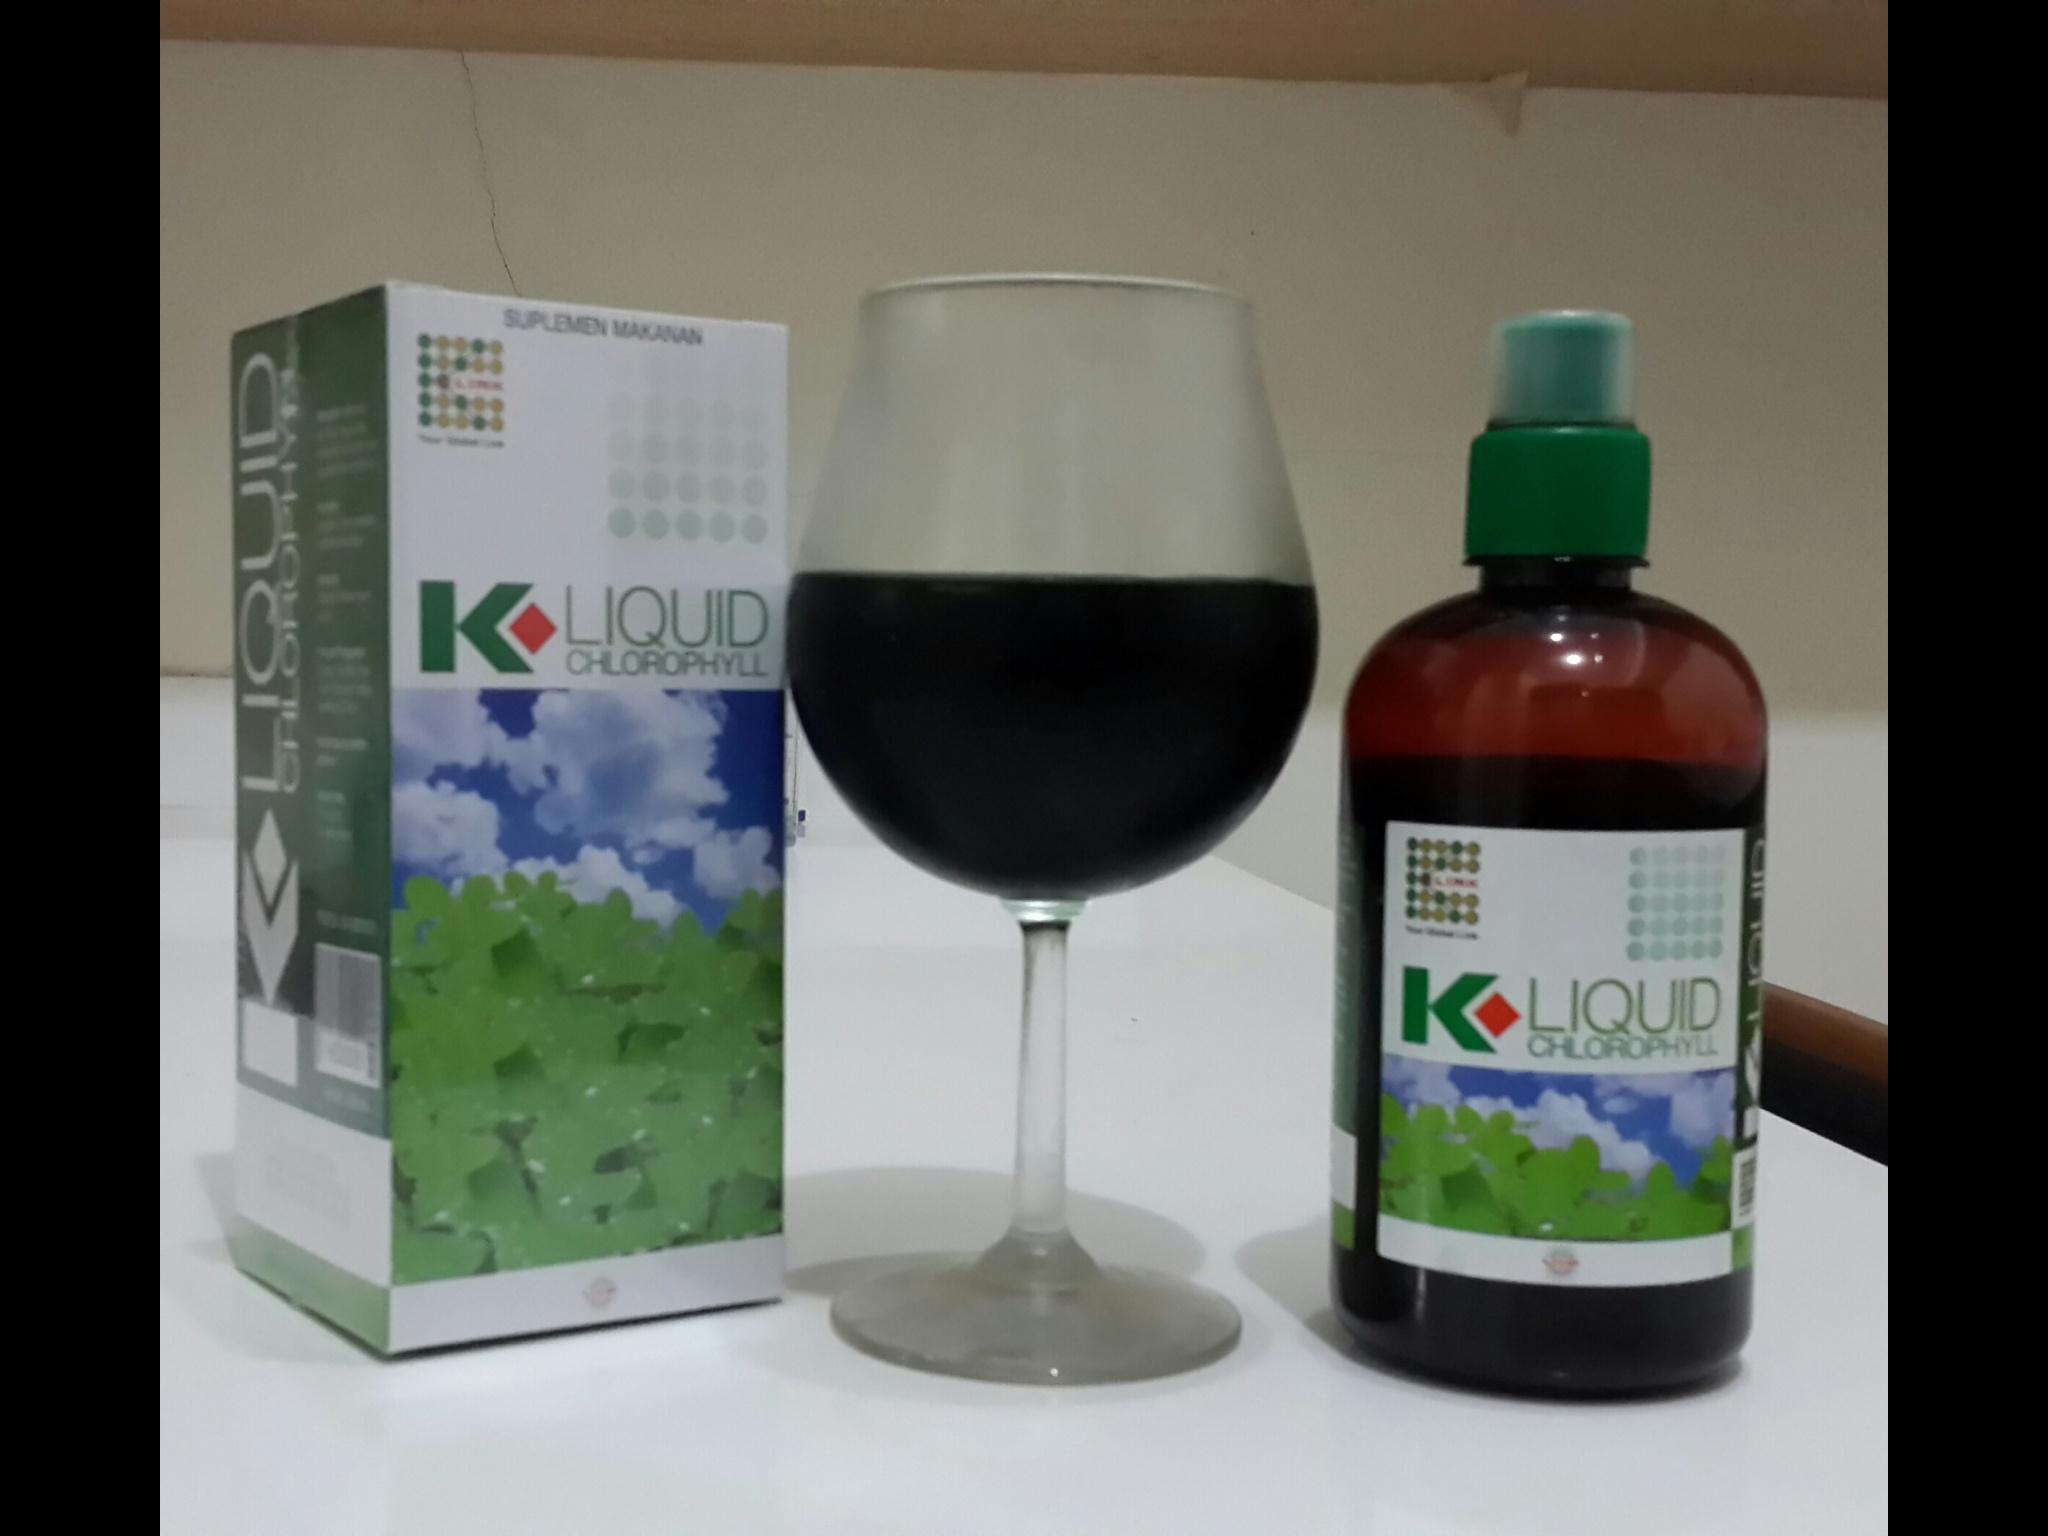 K Liquid Chlorophyll Jual Kosmetik Online Bpom Lengkap Asli Dan Klorofil Chlorophyl Sinergy